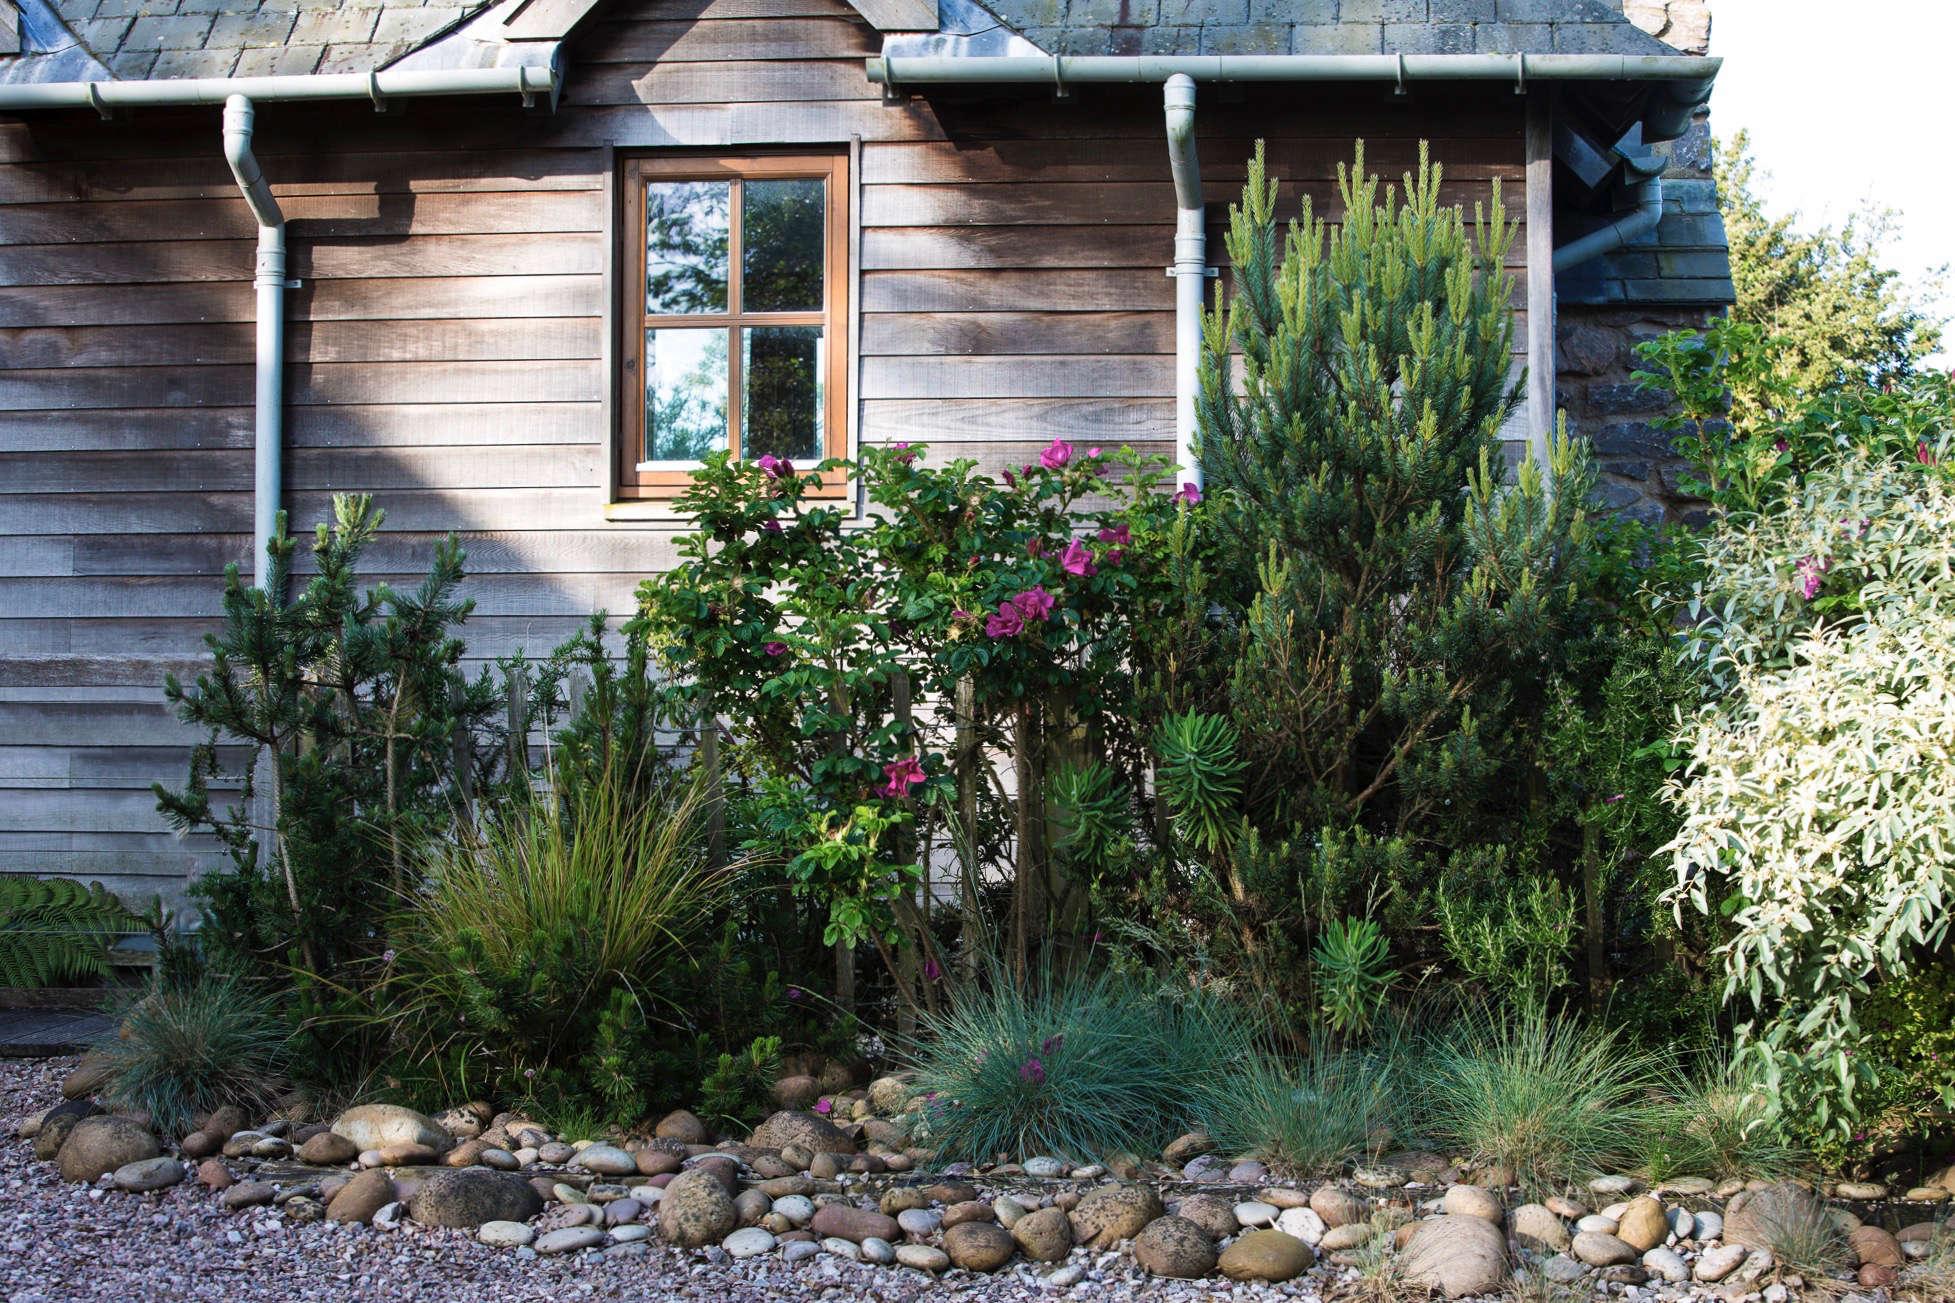 windy-devon-garden-facade-siding-gutters-gravel-clare-takacs-6